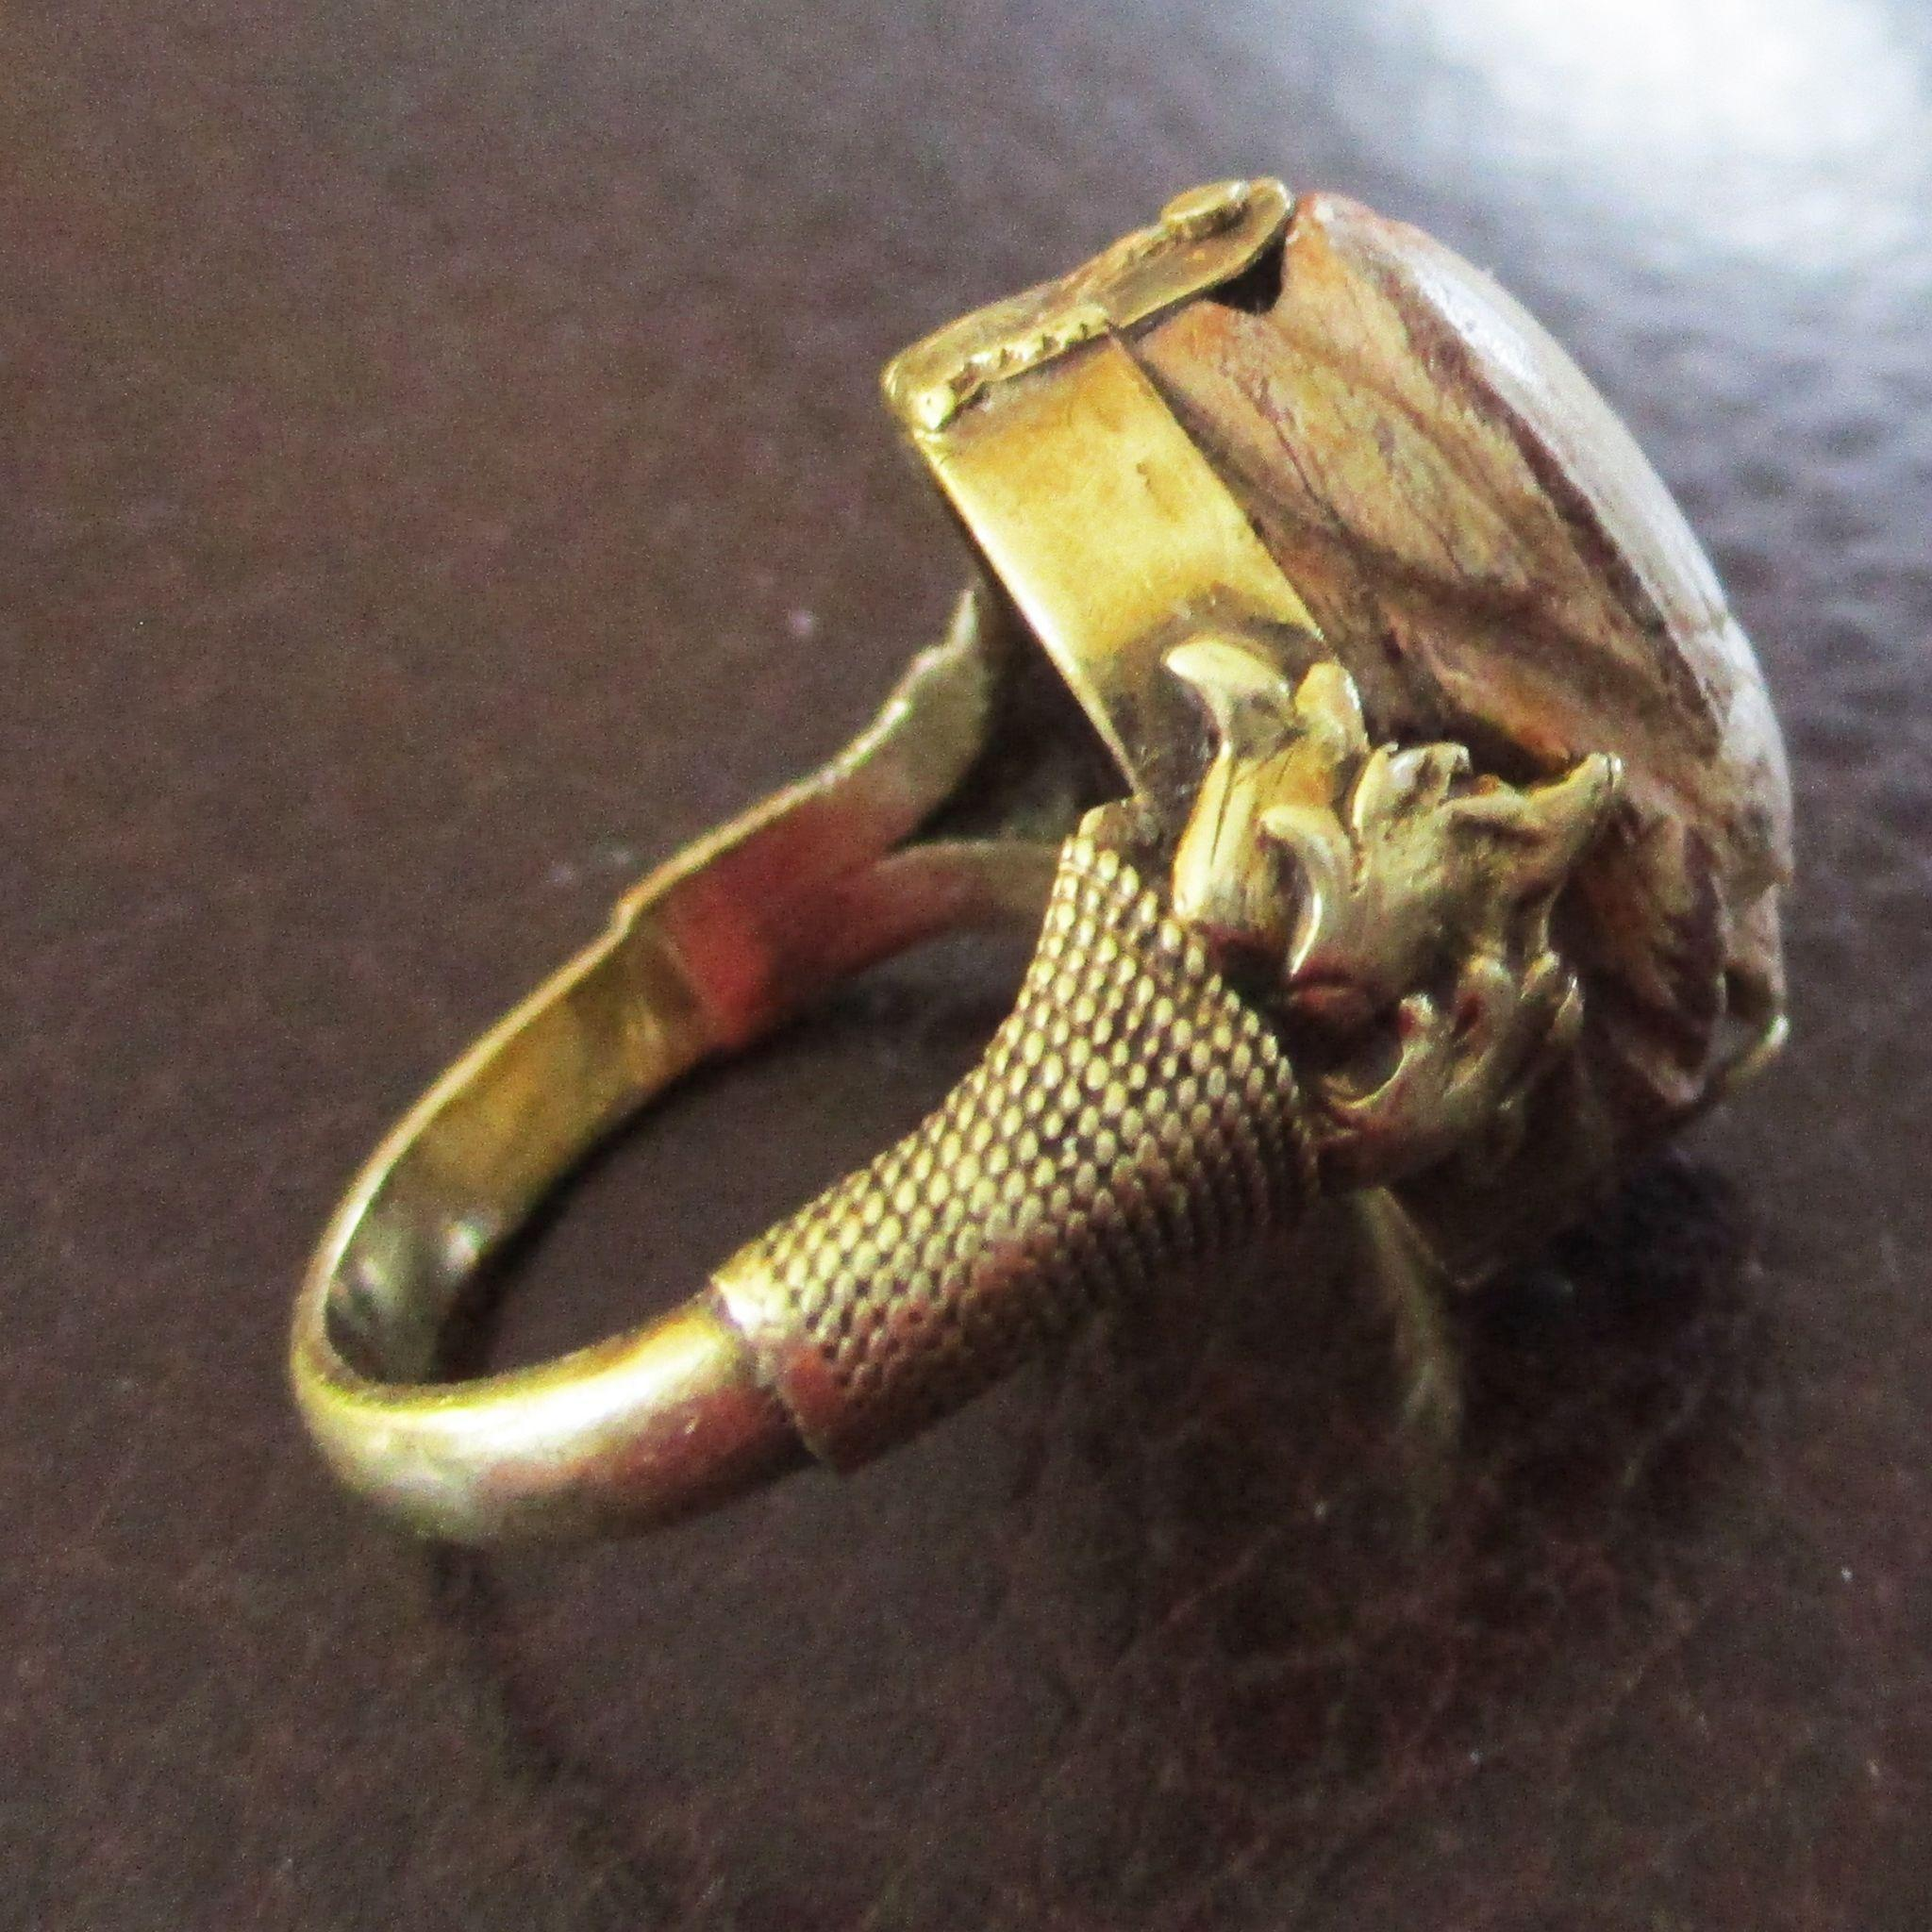 18K Deco Etruscan Revival Scarab Ring